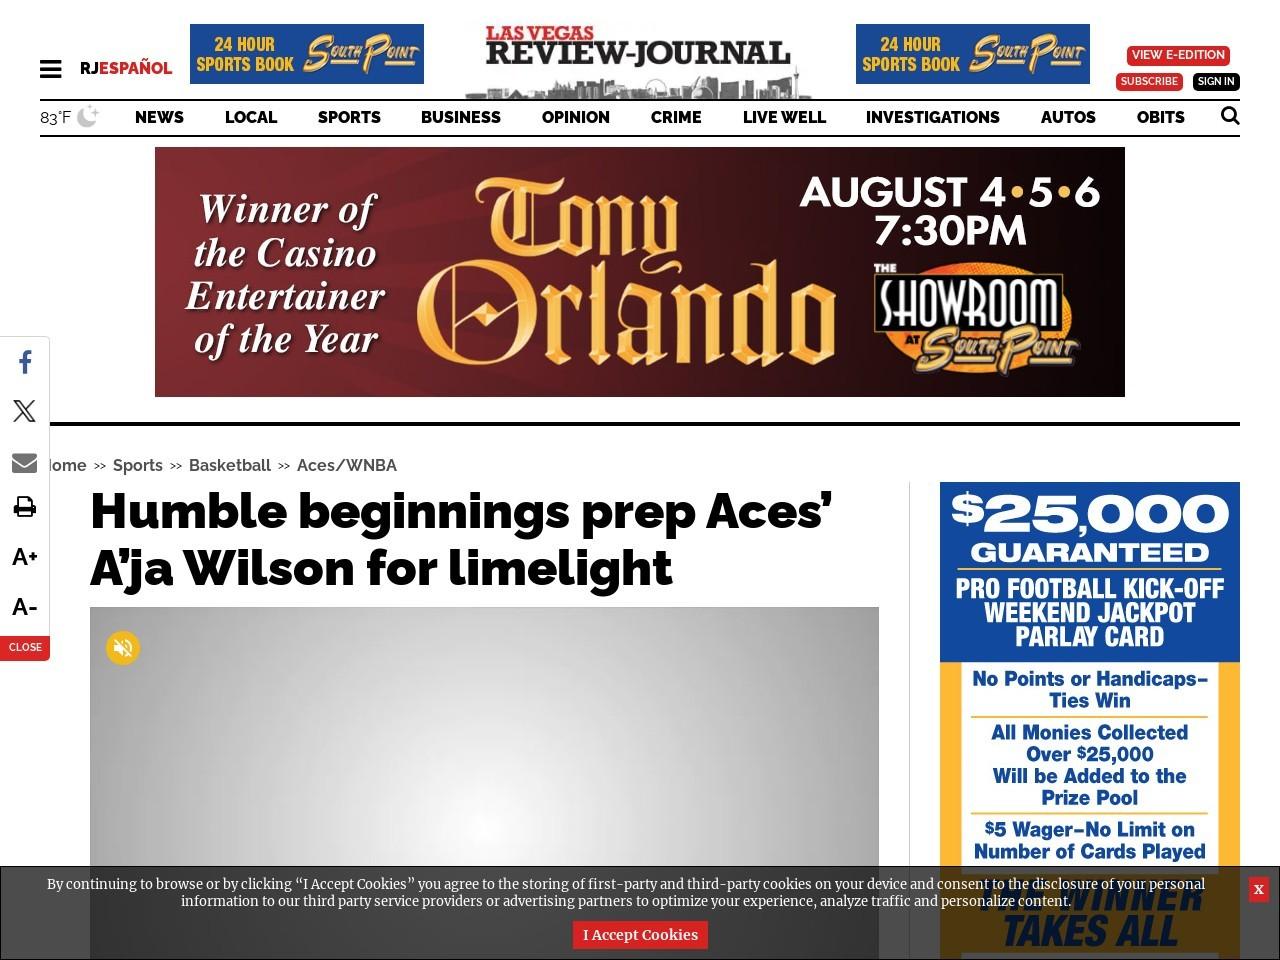 Humble beginnings prep Aces' A'ja Wilson for limelight